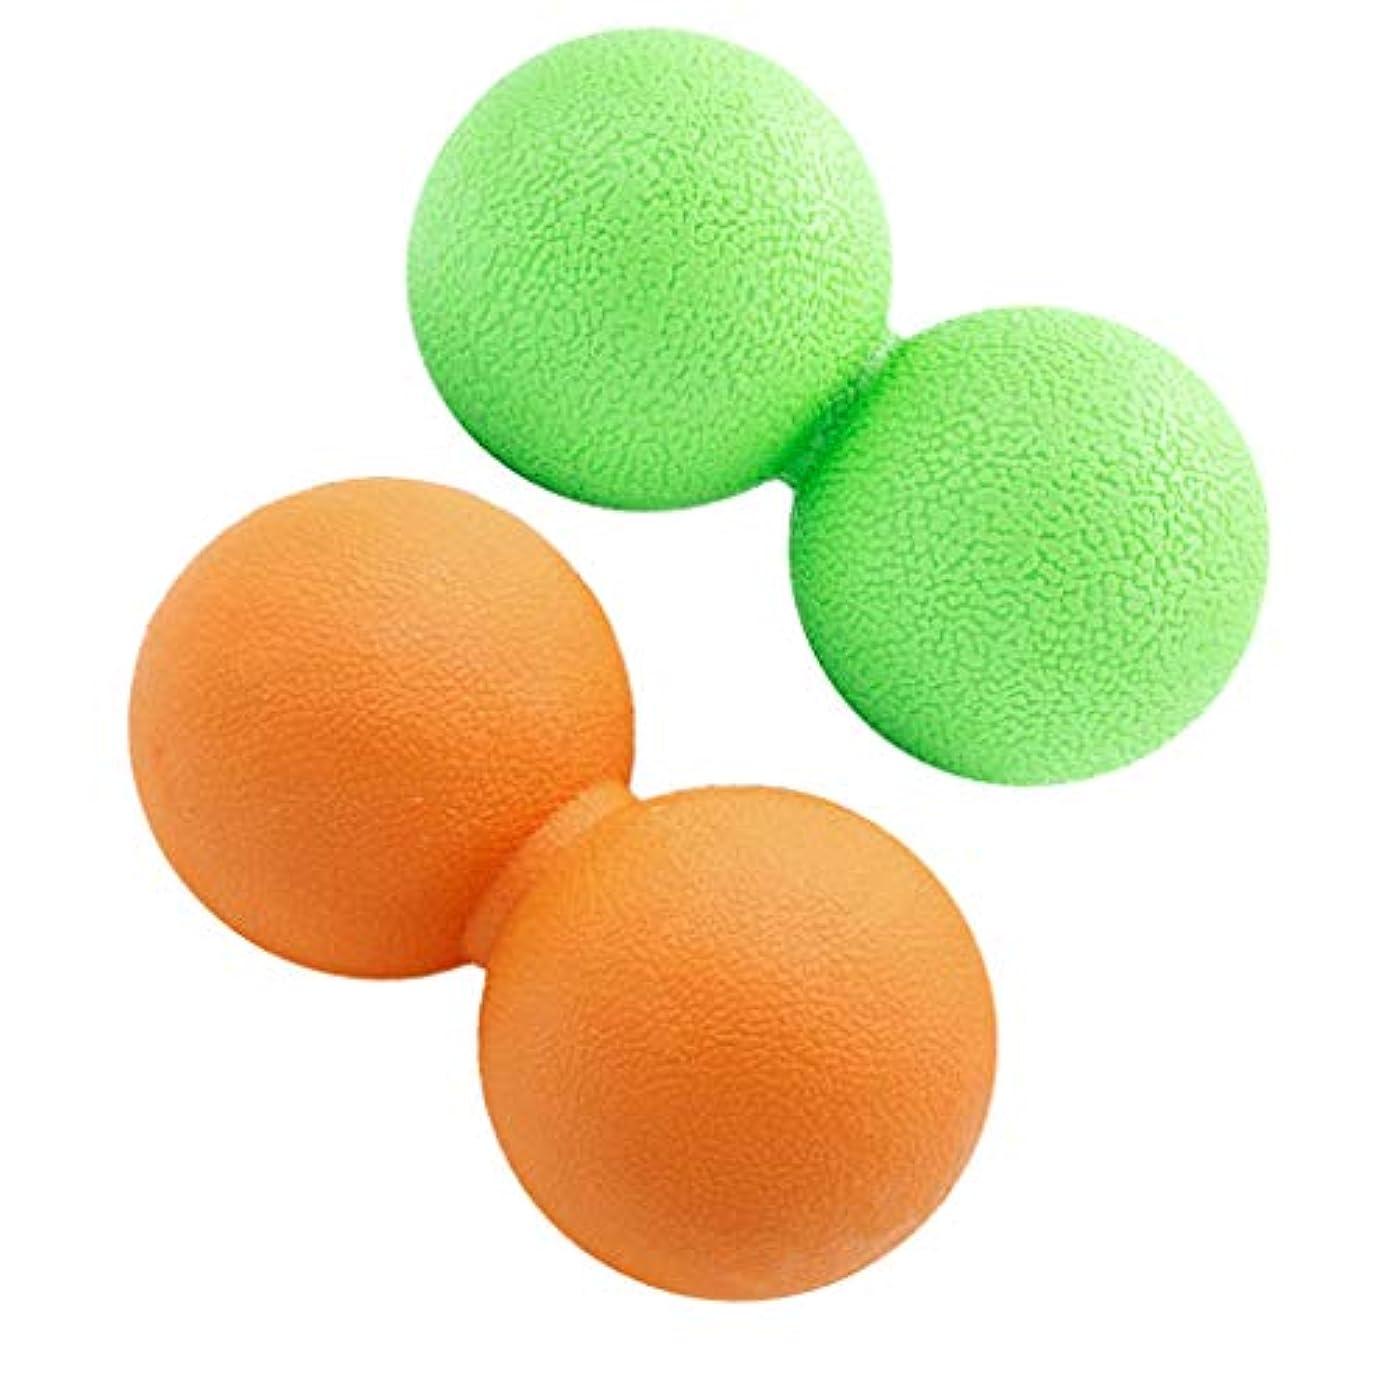 KESOTO 2個 マッサージボール ピーナッツ 疲れ解消ボール トリガーポイント 筋膜リリース ツボ押しグッズ